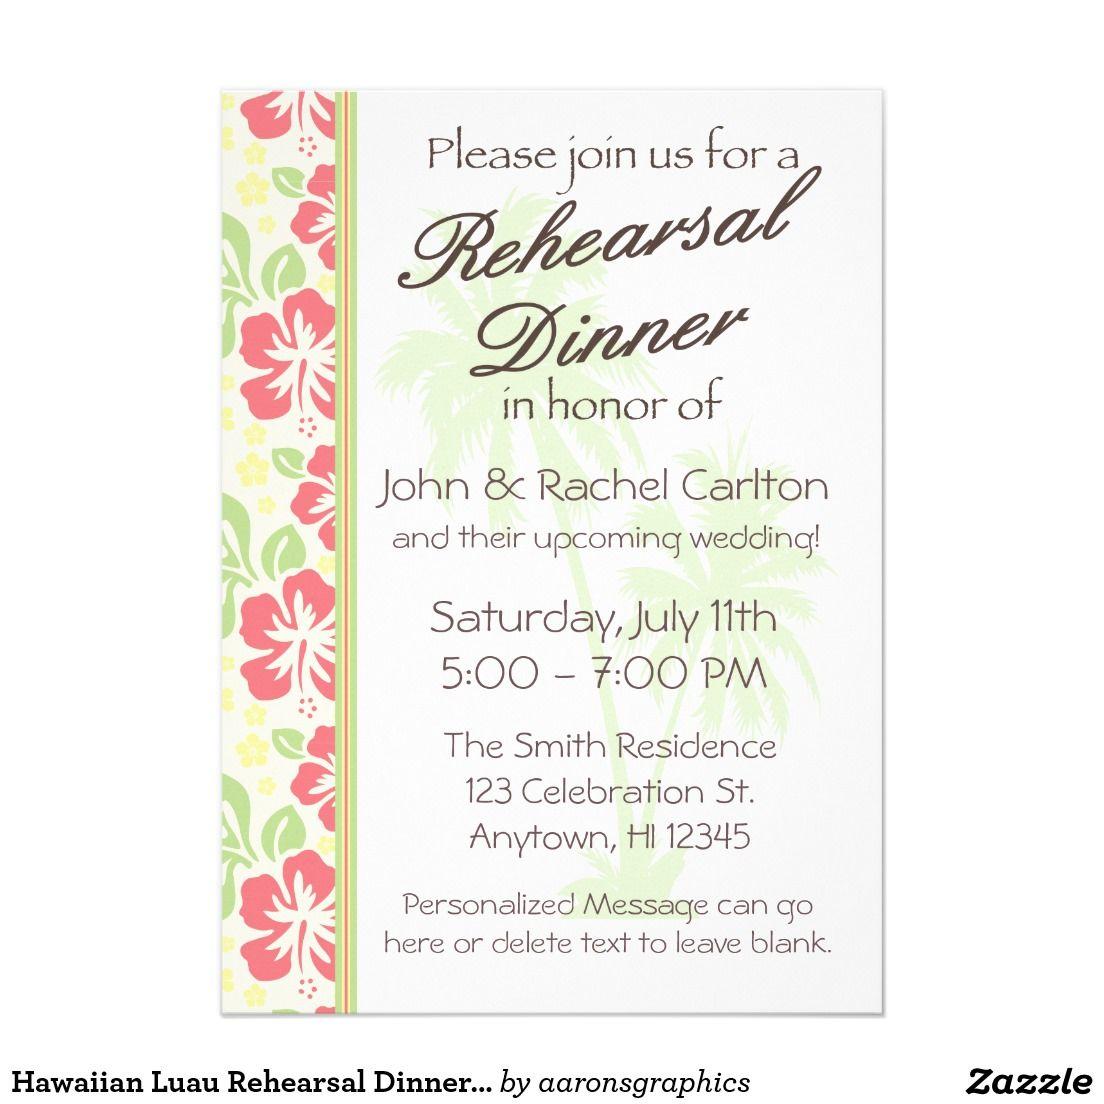 Hawaiian Luau Rehearsal Dinner Party Invitation Rehearsal Dinner